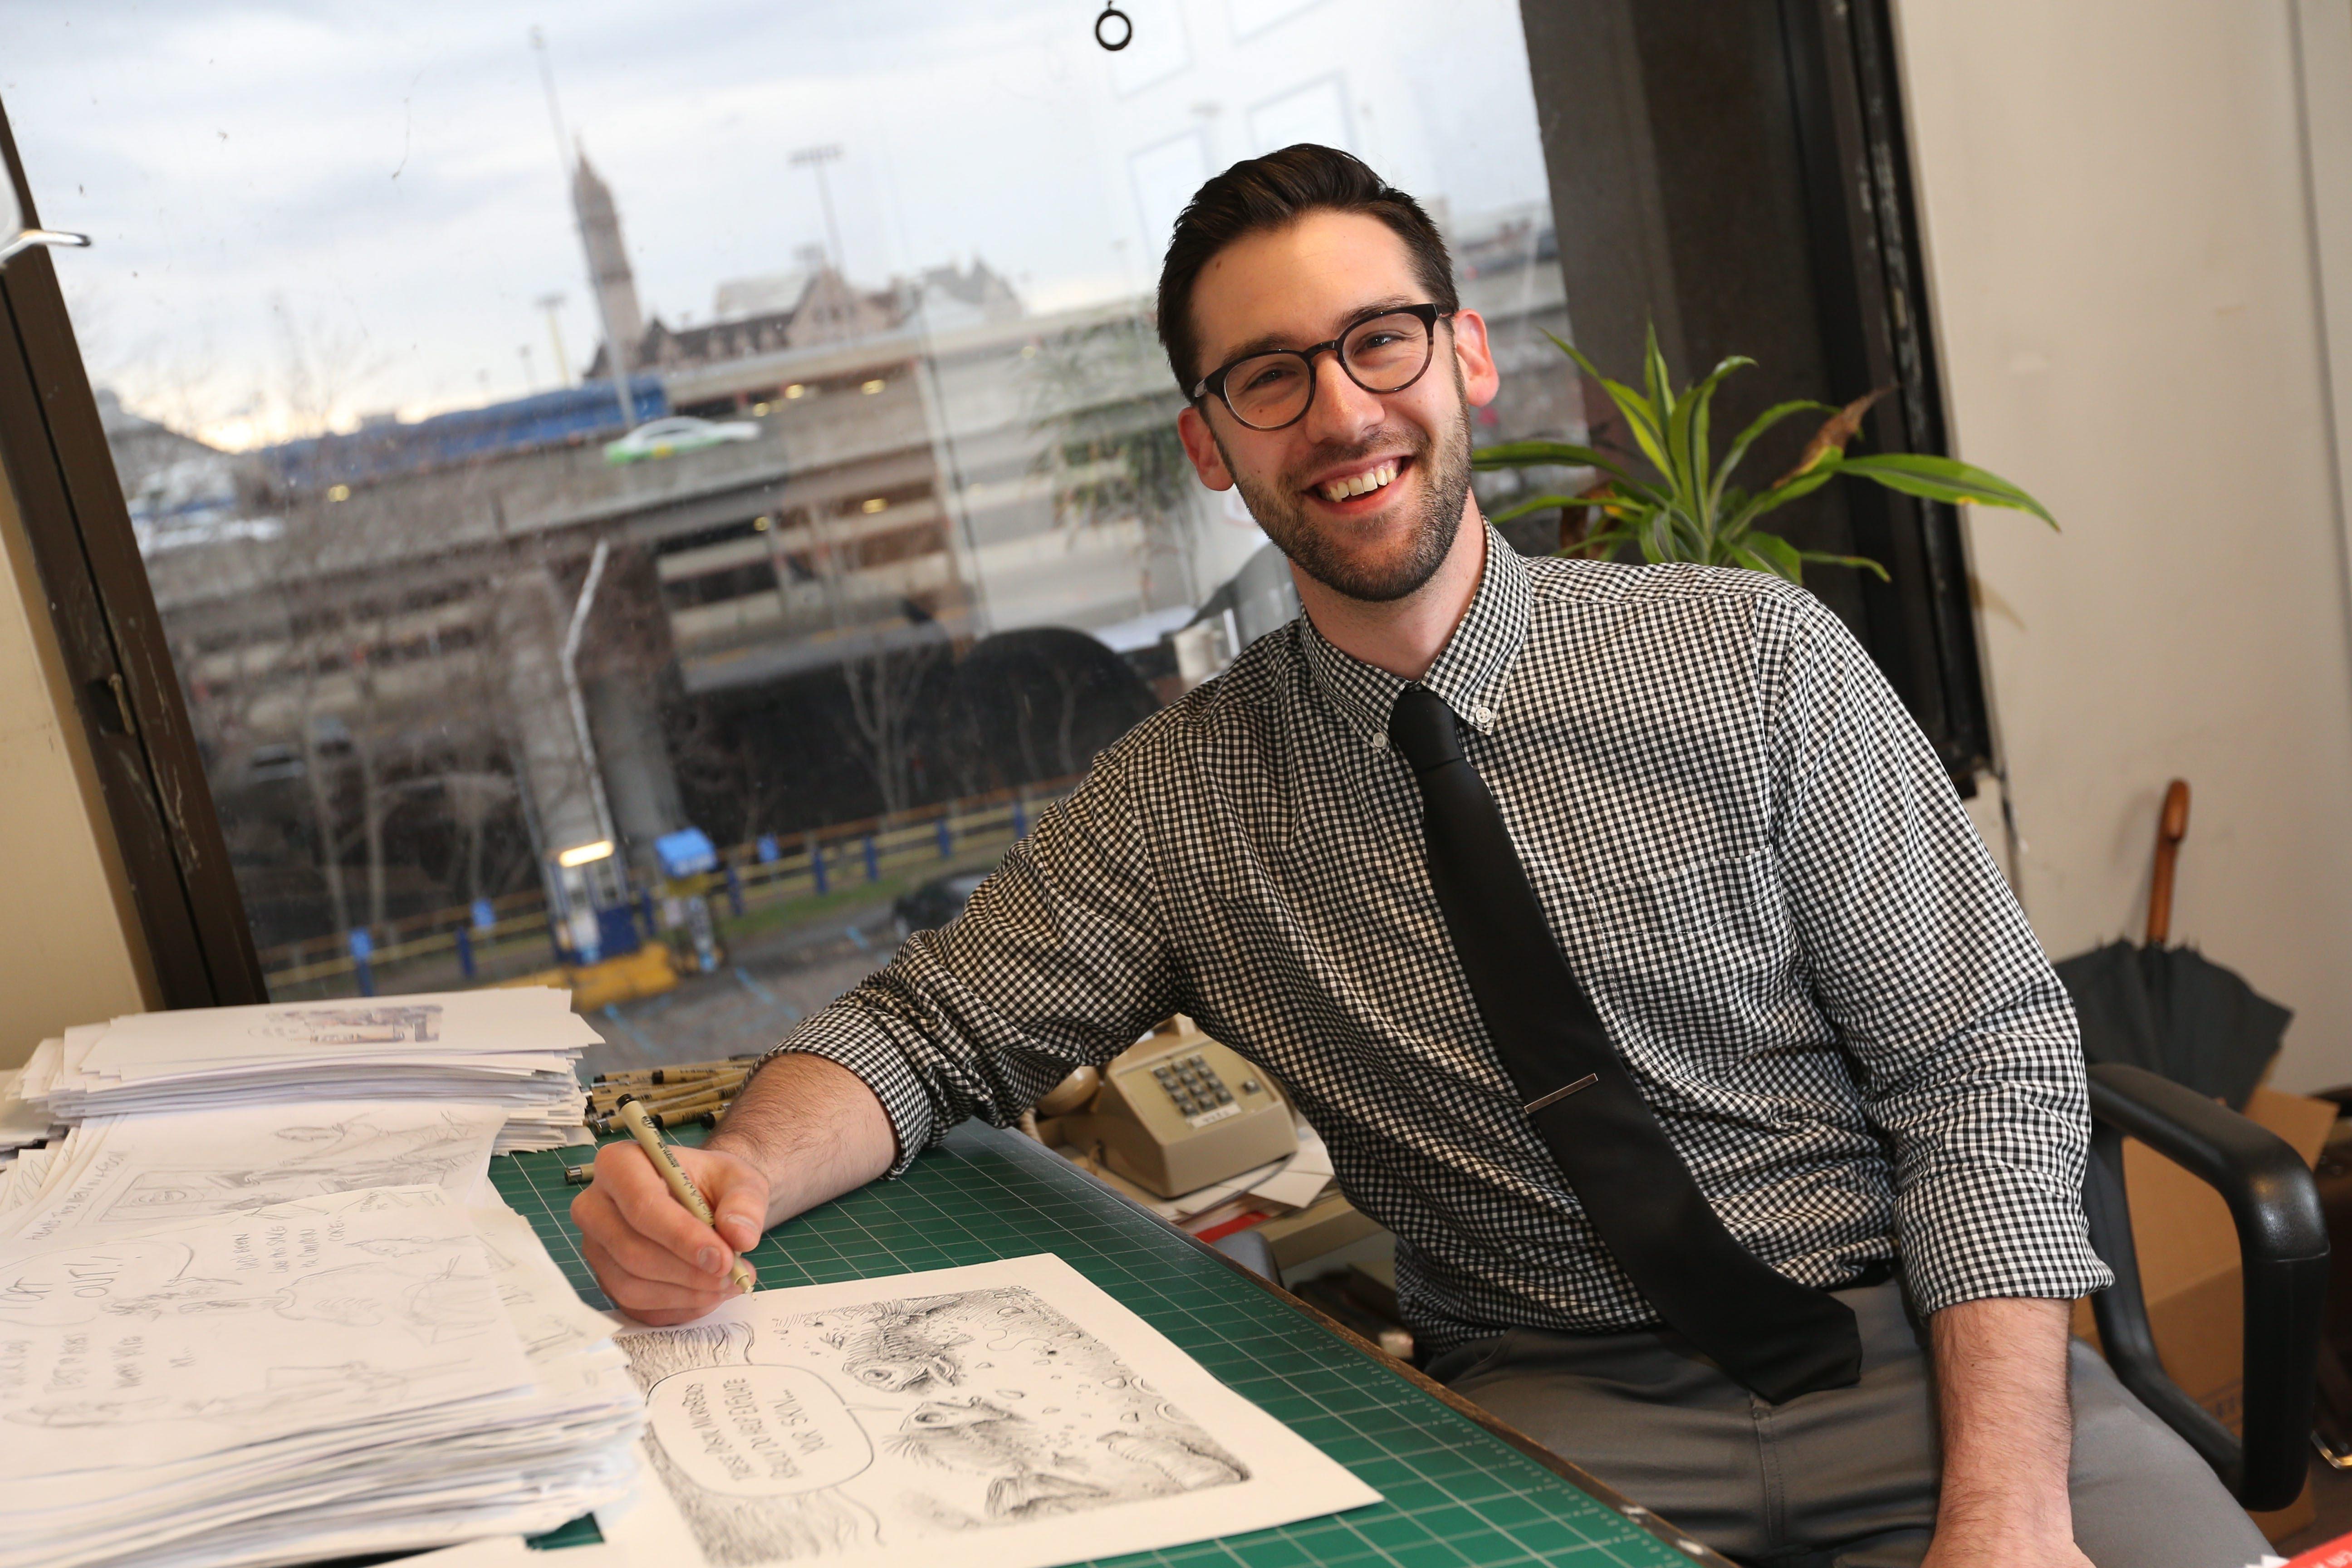 Buffalo News cartoonist Adam Zyglis won the Pulitzer Prize on Monday.